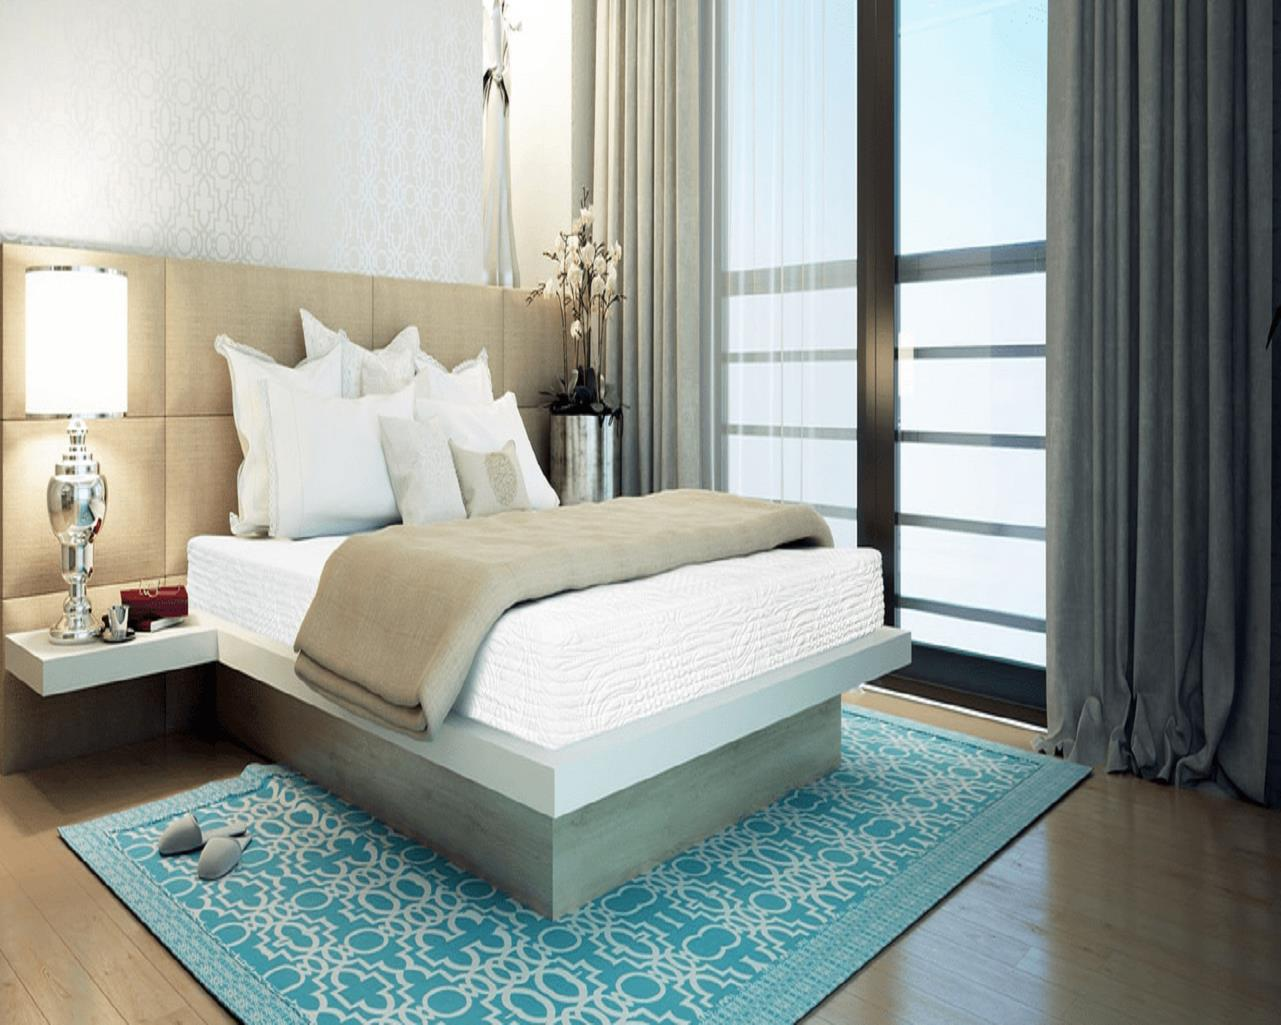 natural mattresses